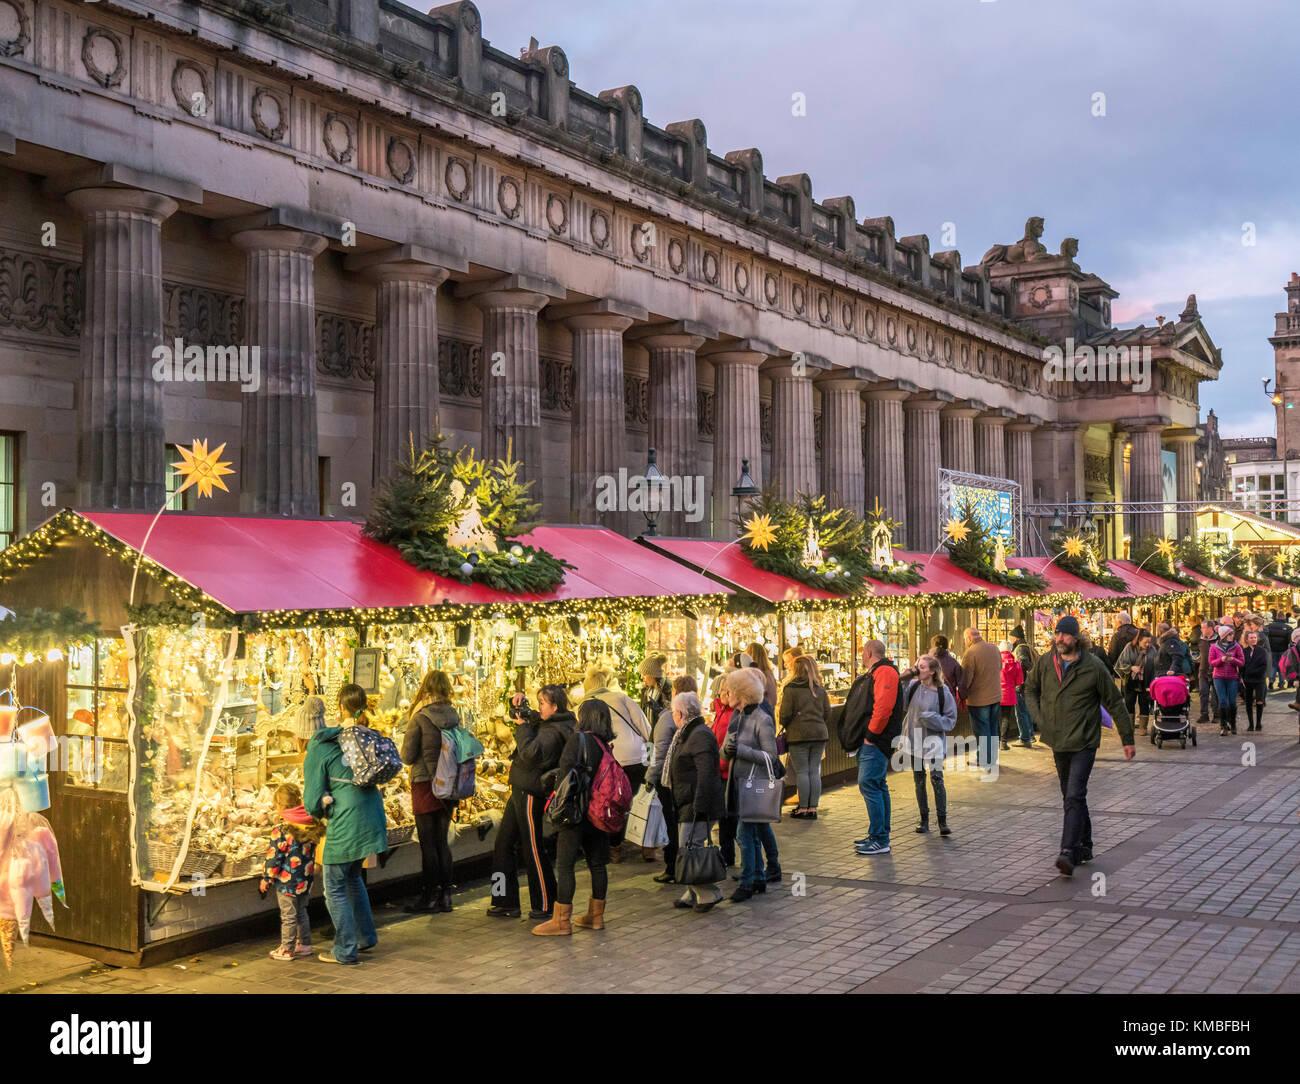 Edinburgh Christmas Stock Photos & Edinburgh Christmas